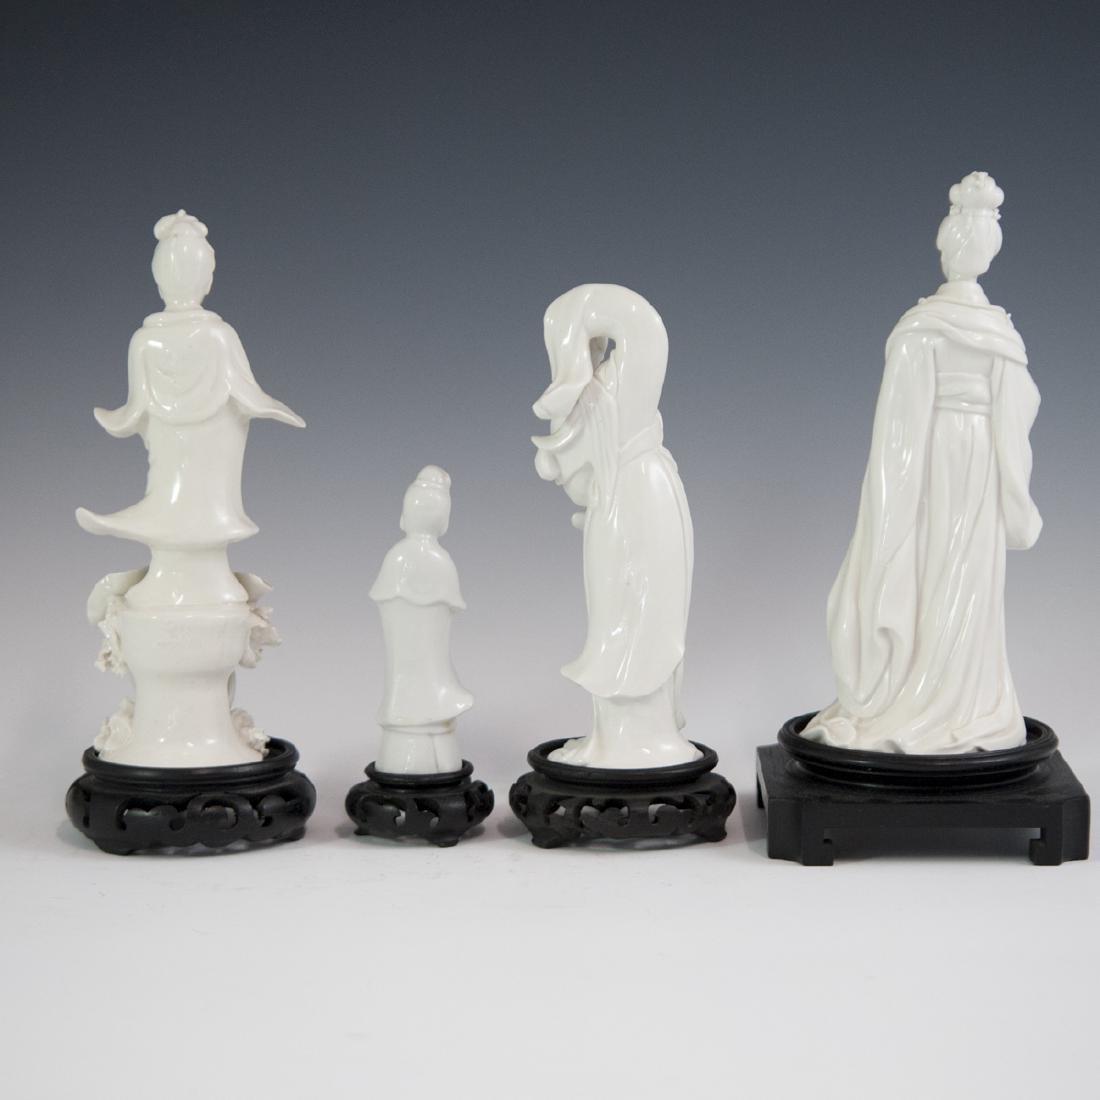 Chinese Blanc De Chine Guanyin Figurines - 5